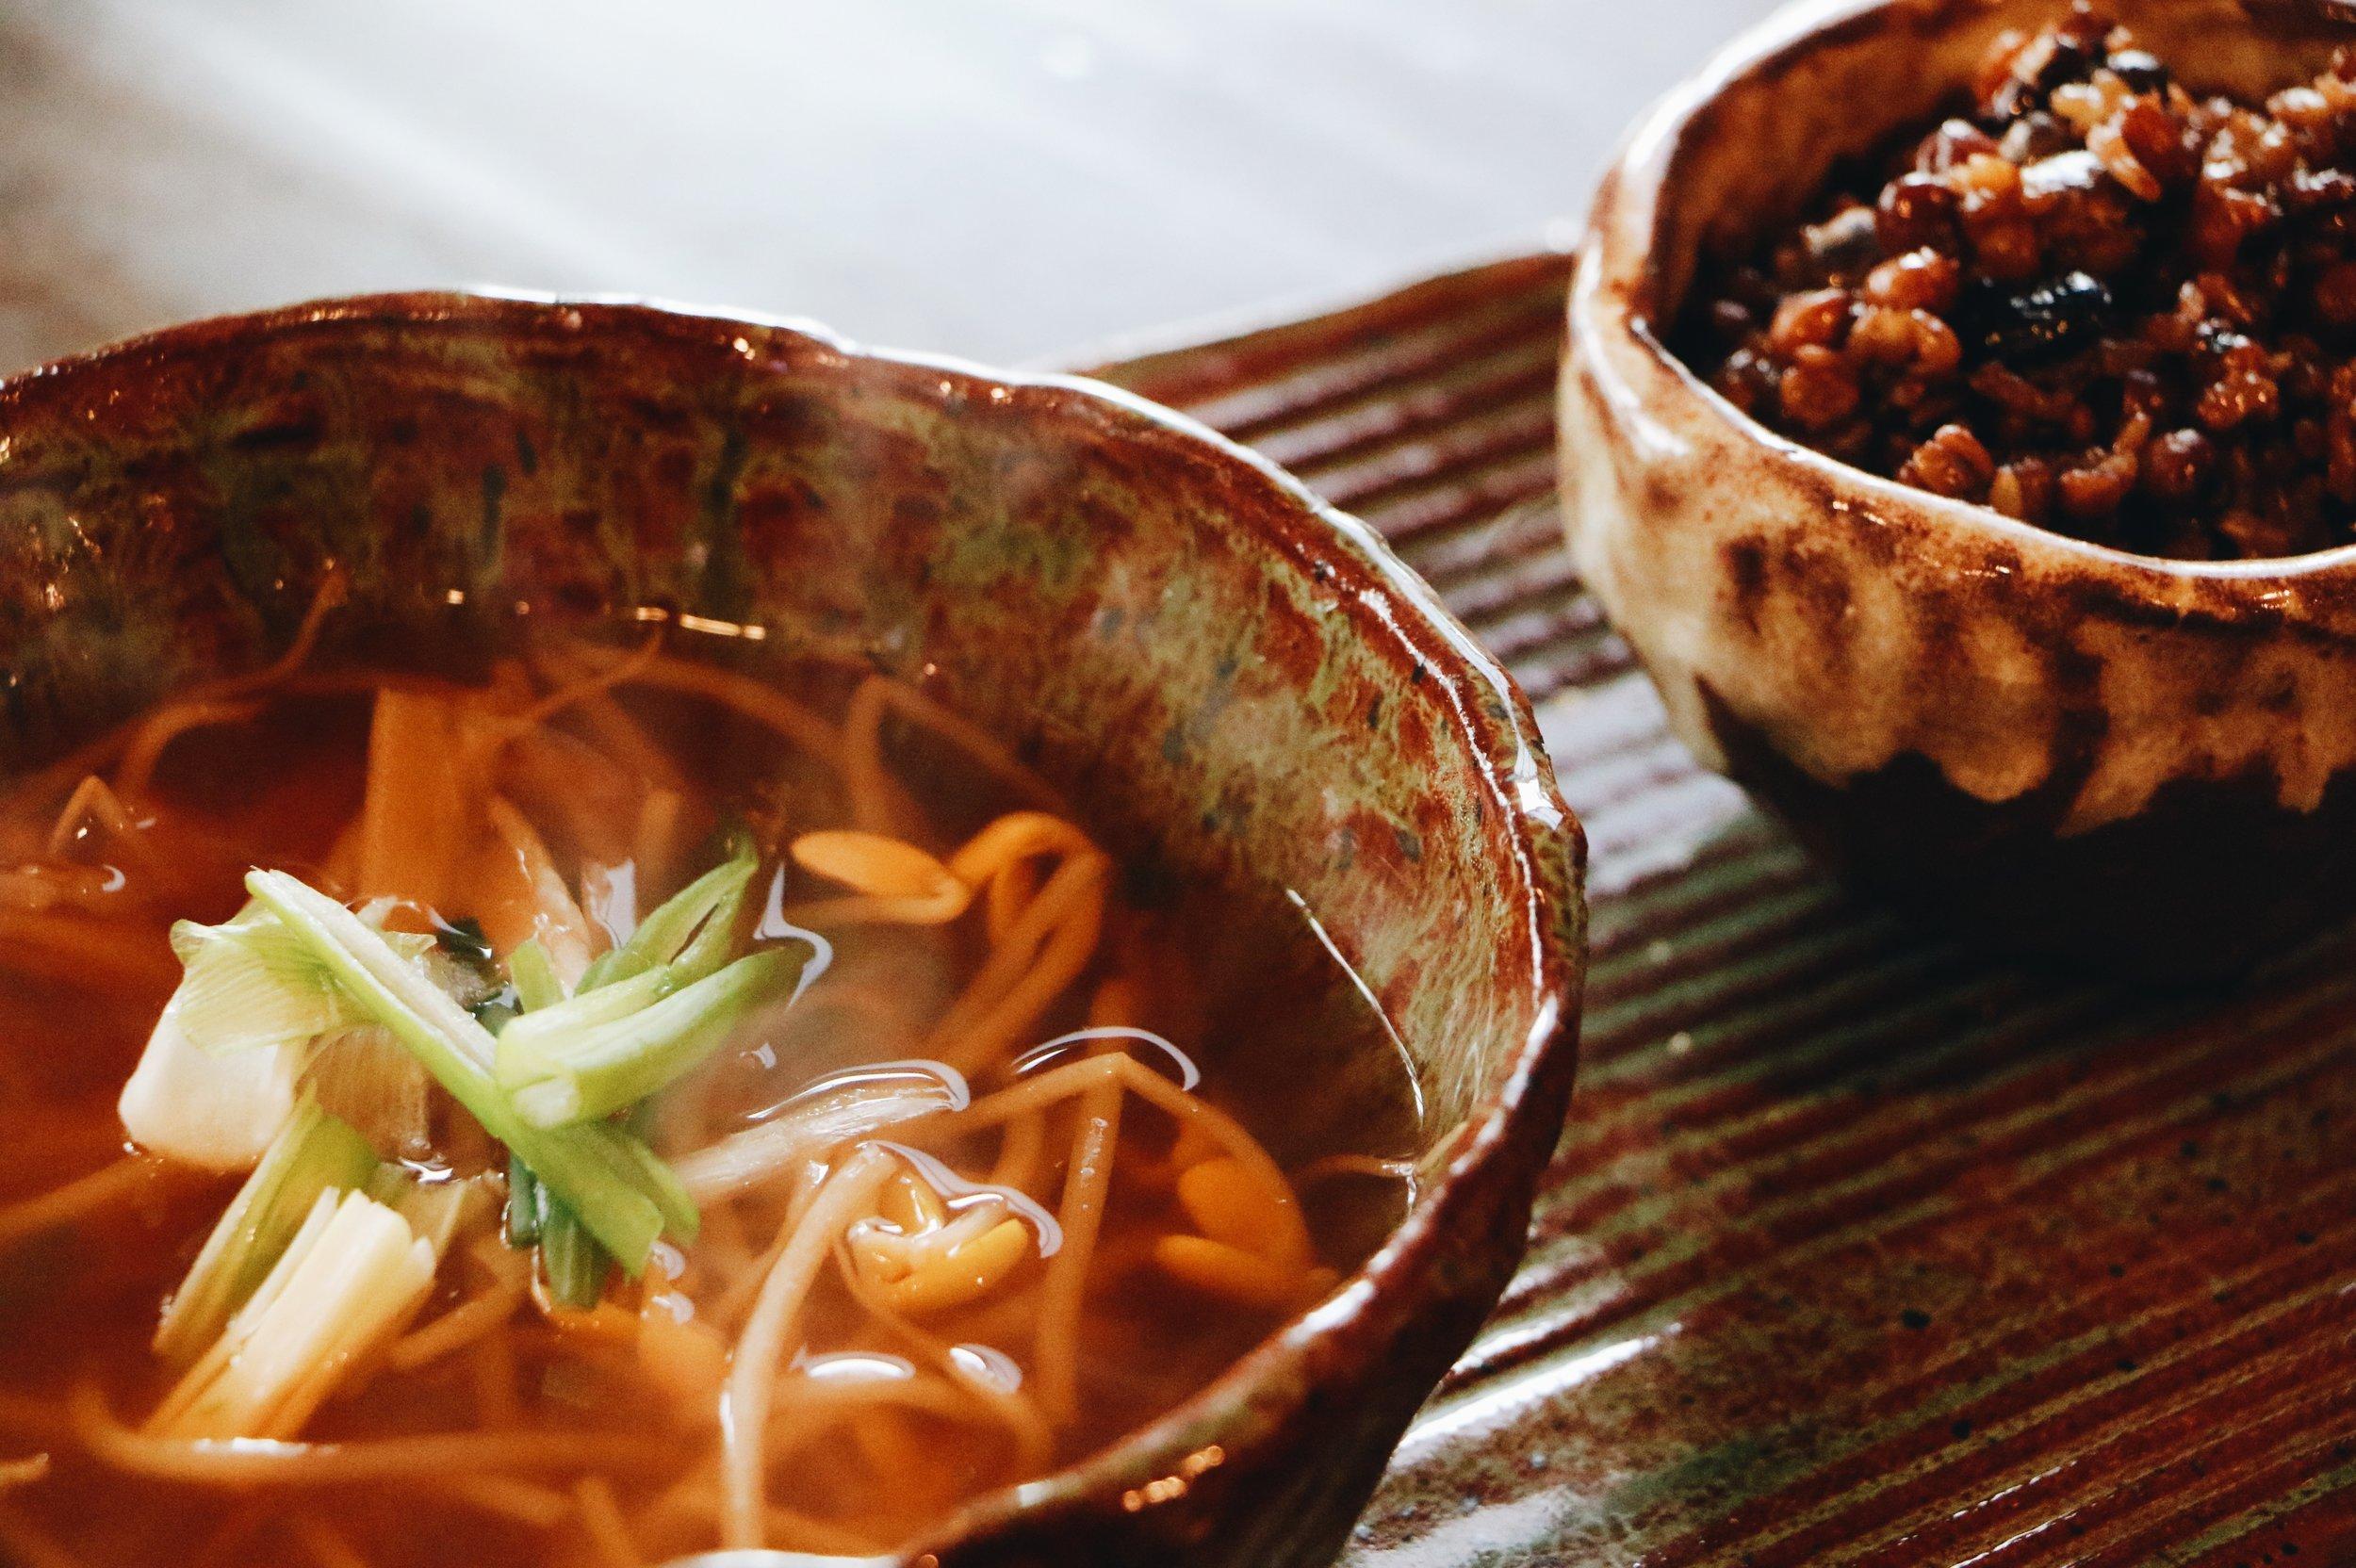 Kongnamul-guk, soybean sprout soup